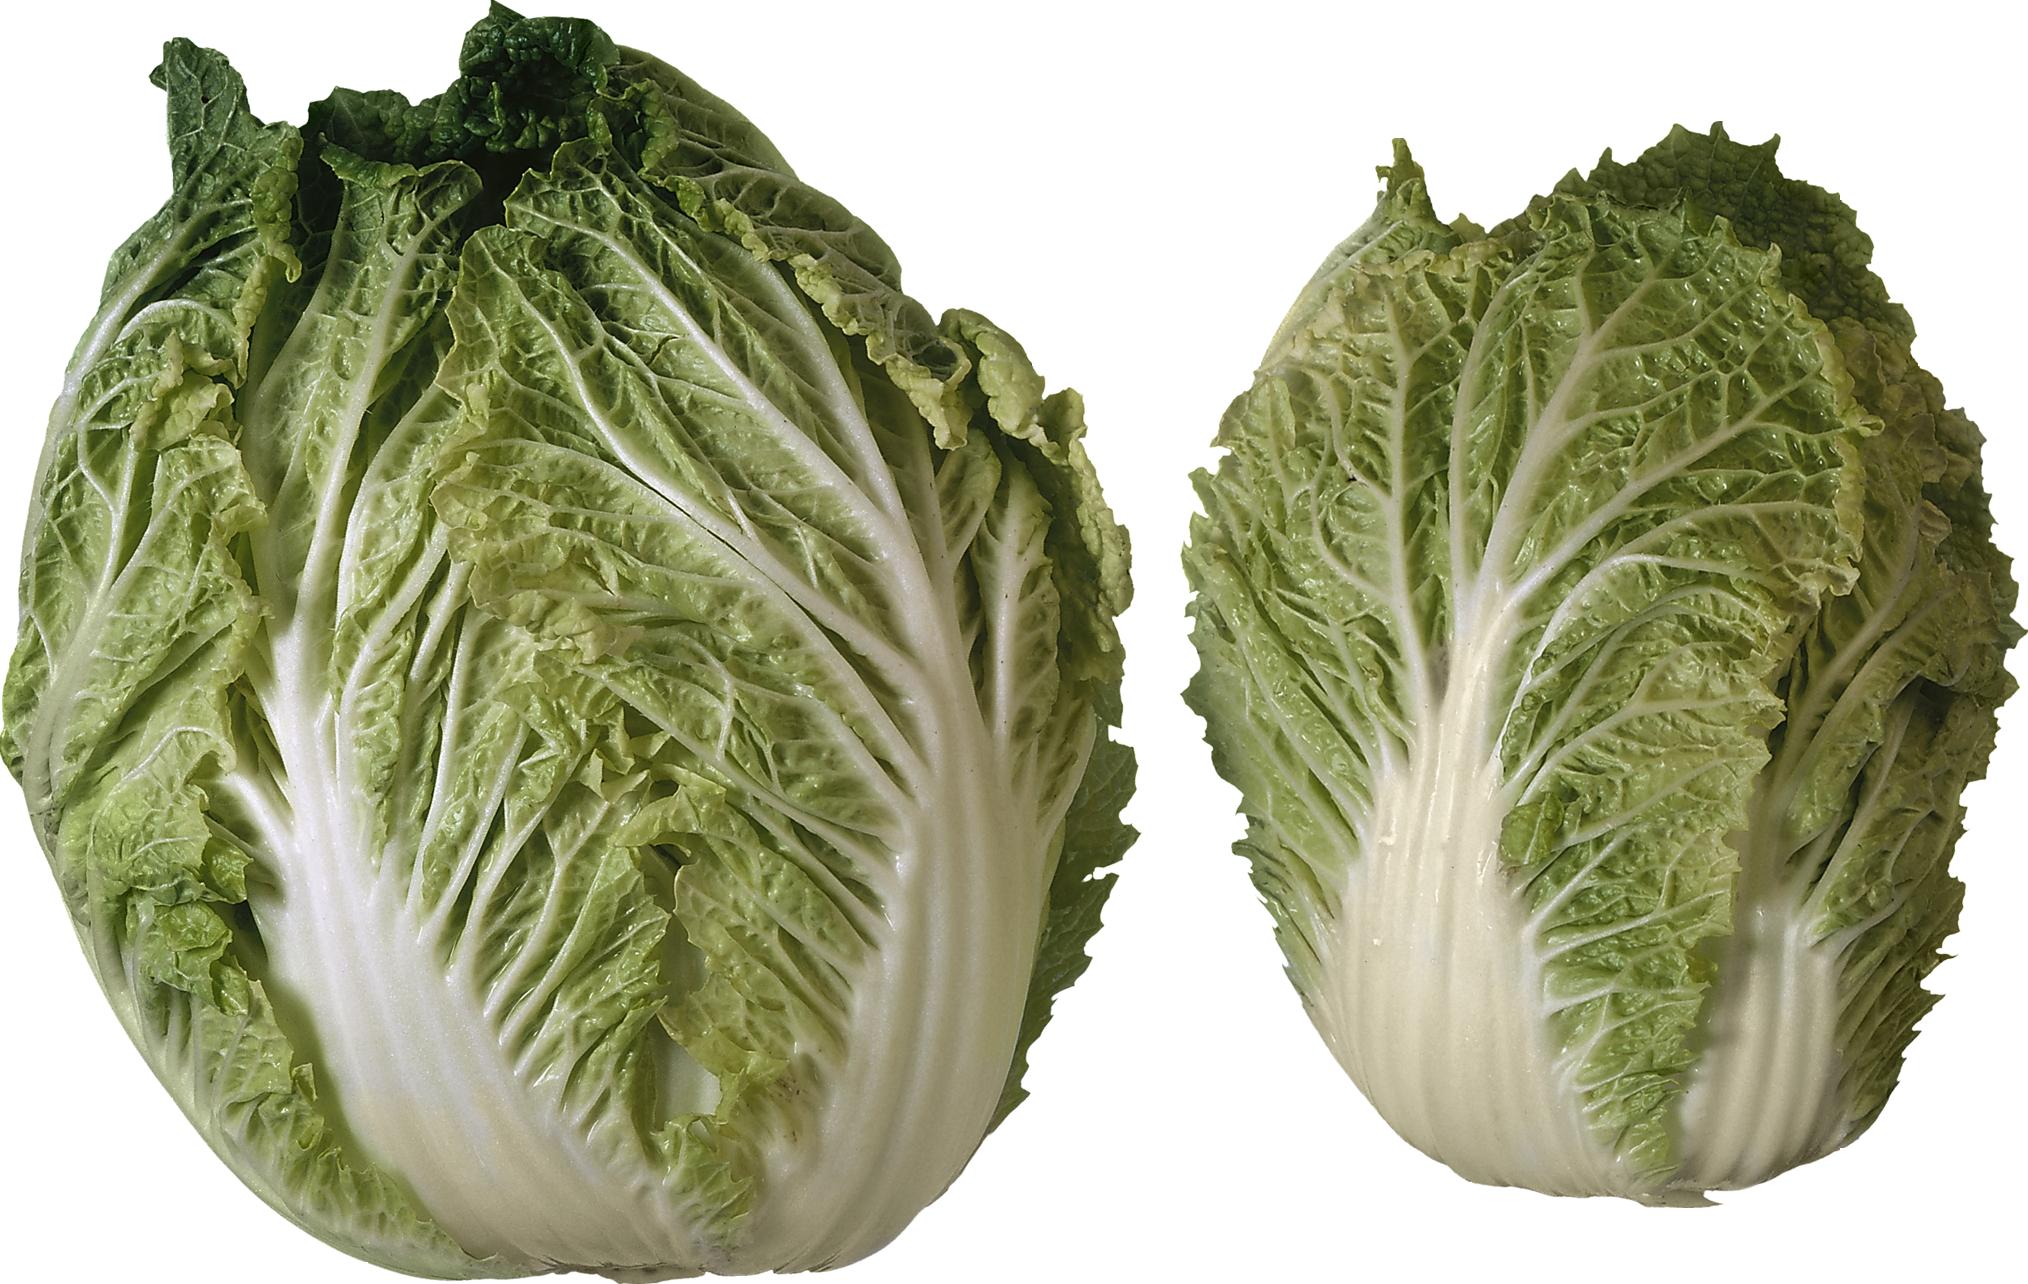 Salad png images free. Lettuce clipart head lettuce